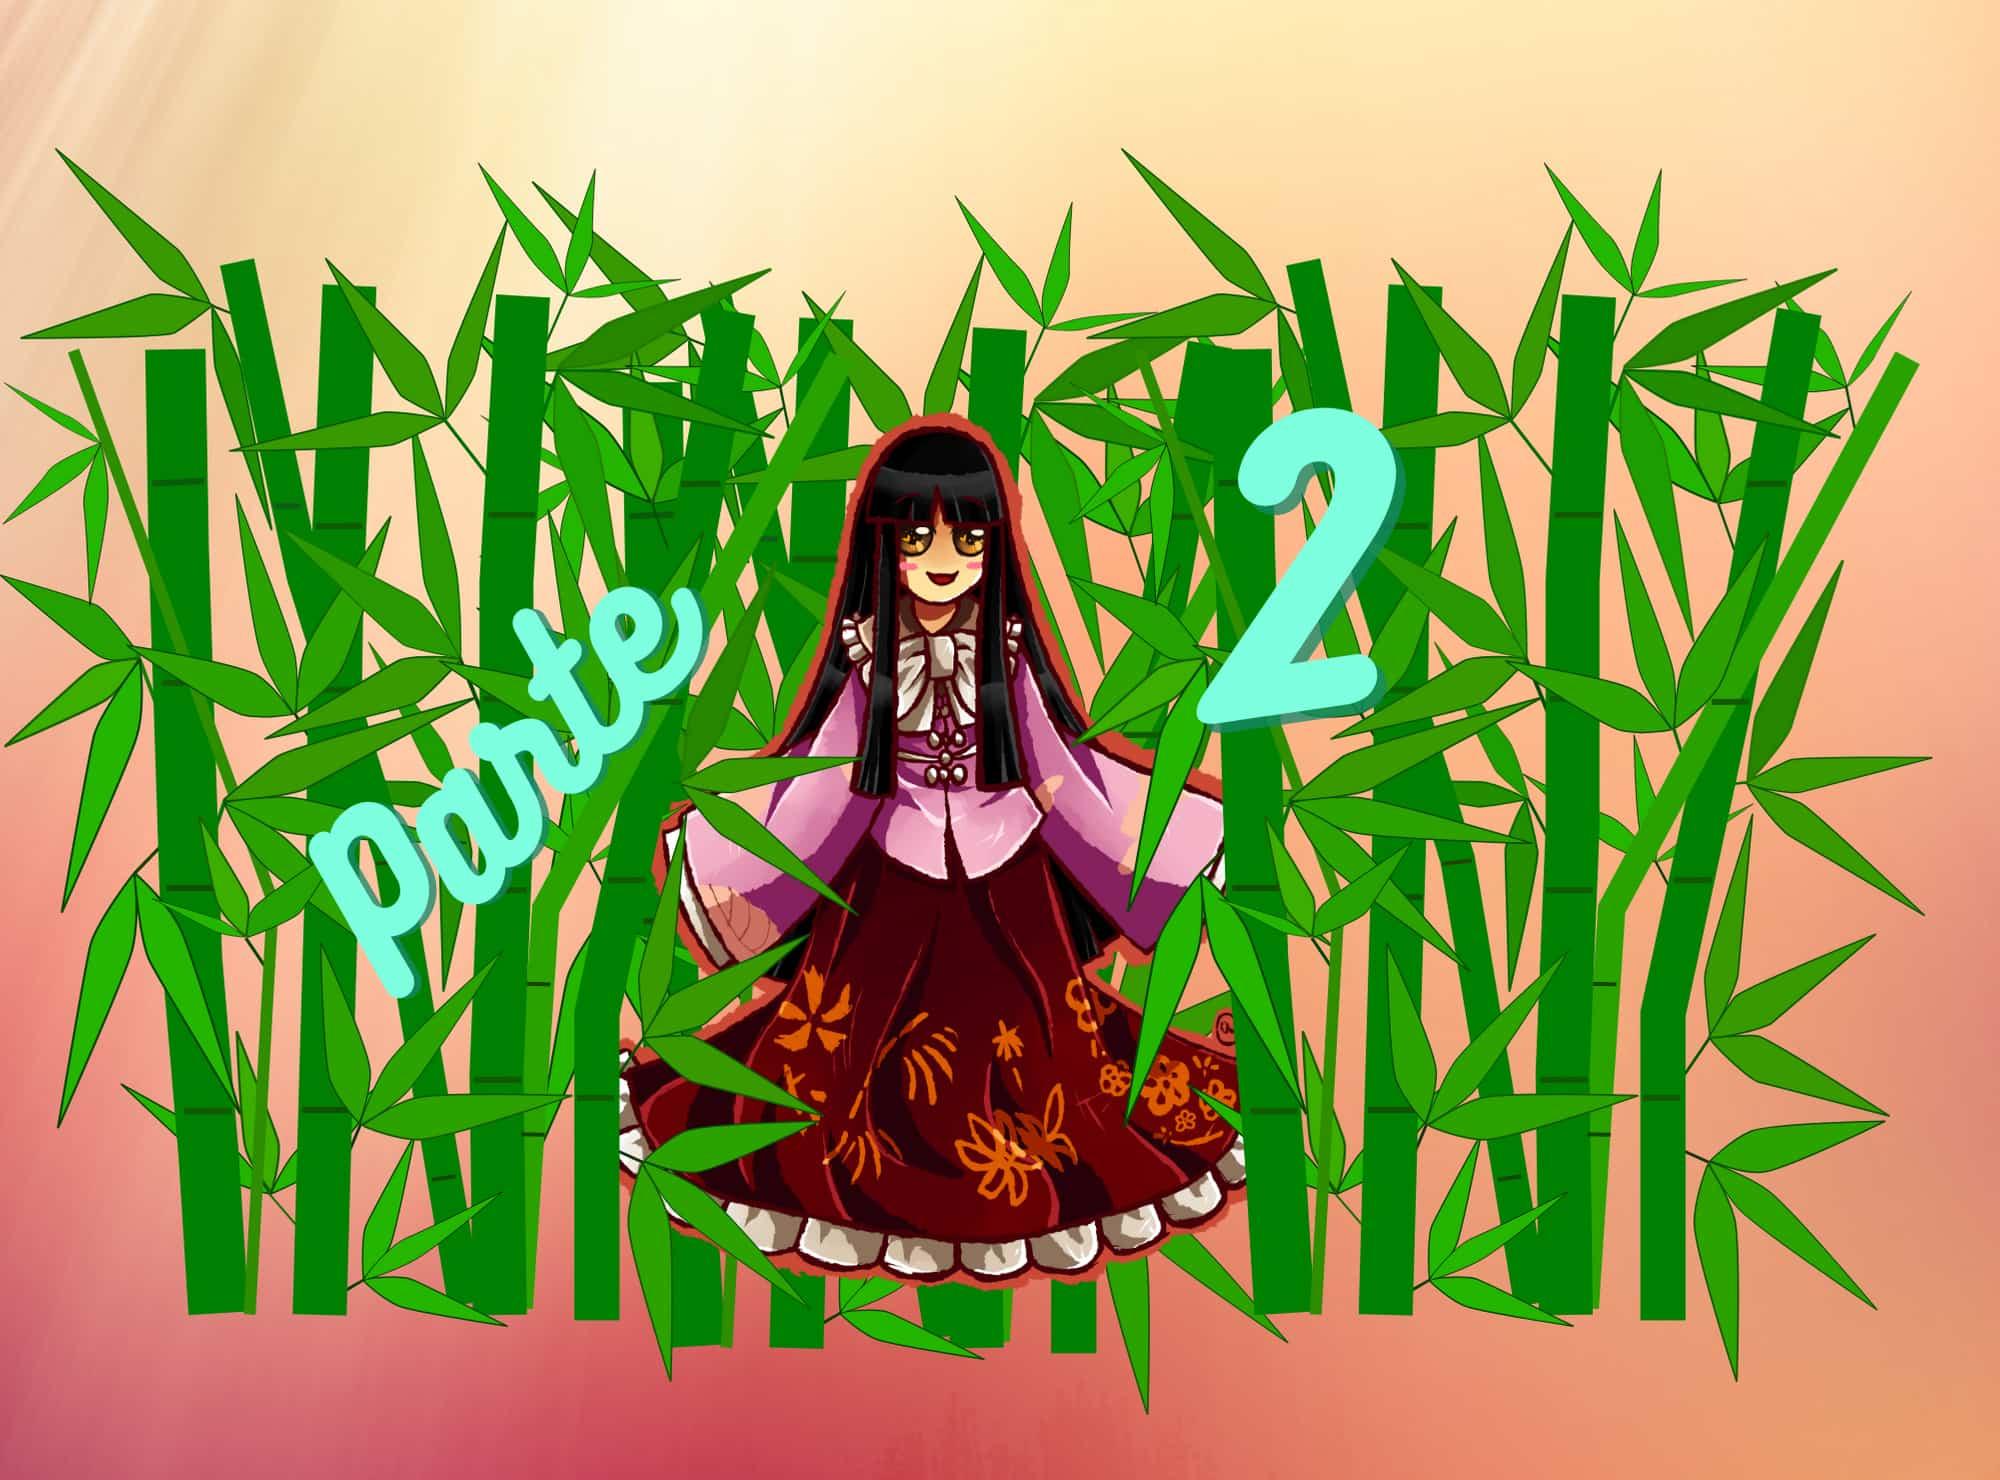 princesa kaguya parte 2